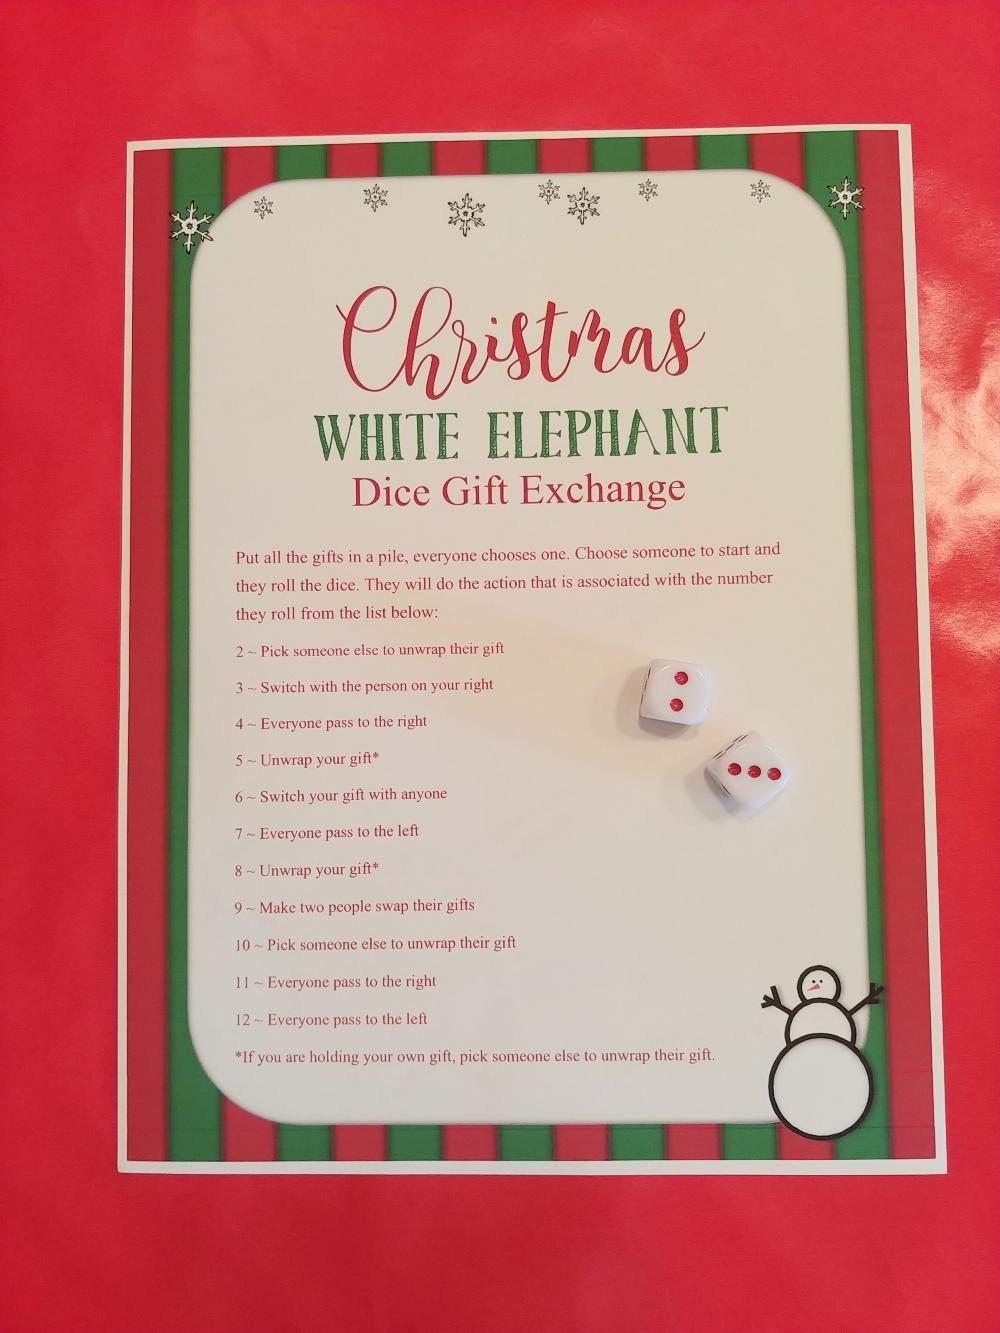 https://www.littlevintagecottage.com/2020/10/christmas-white-elephant-gift-exchange.html